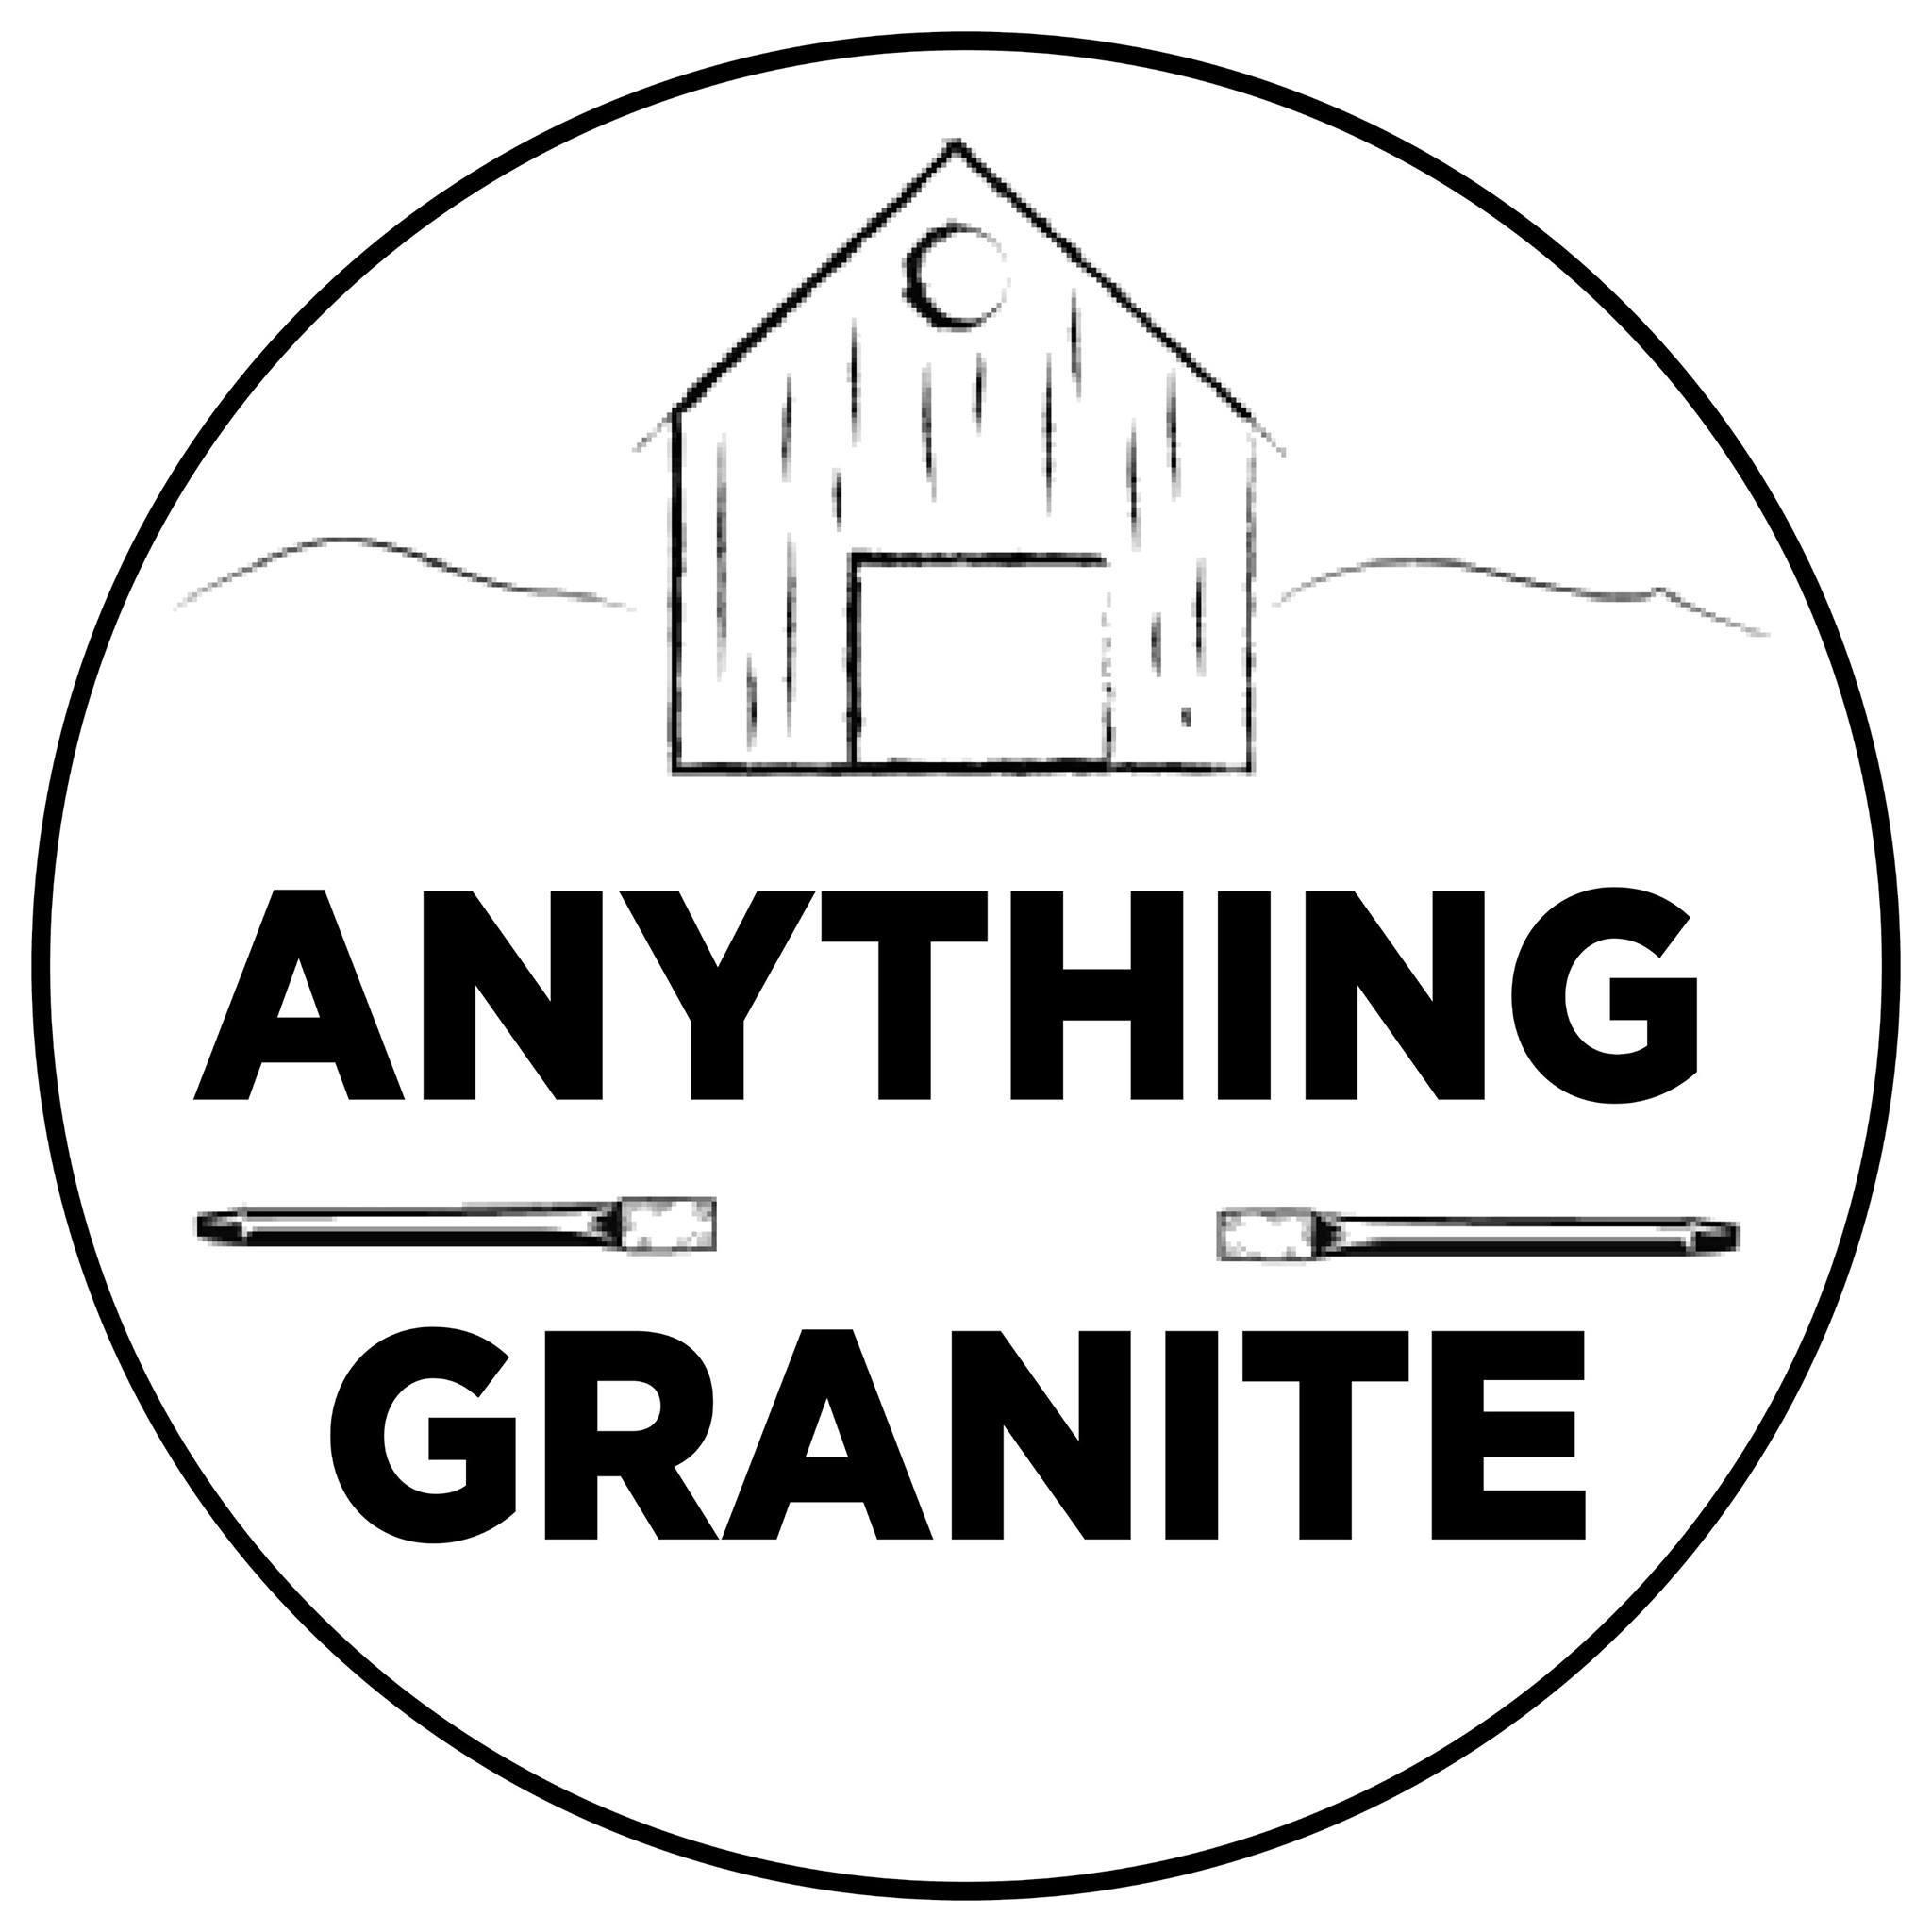 anything_granite.jpg